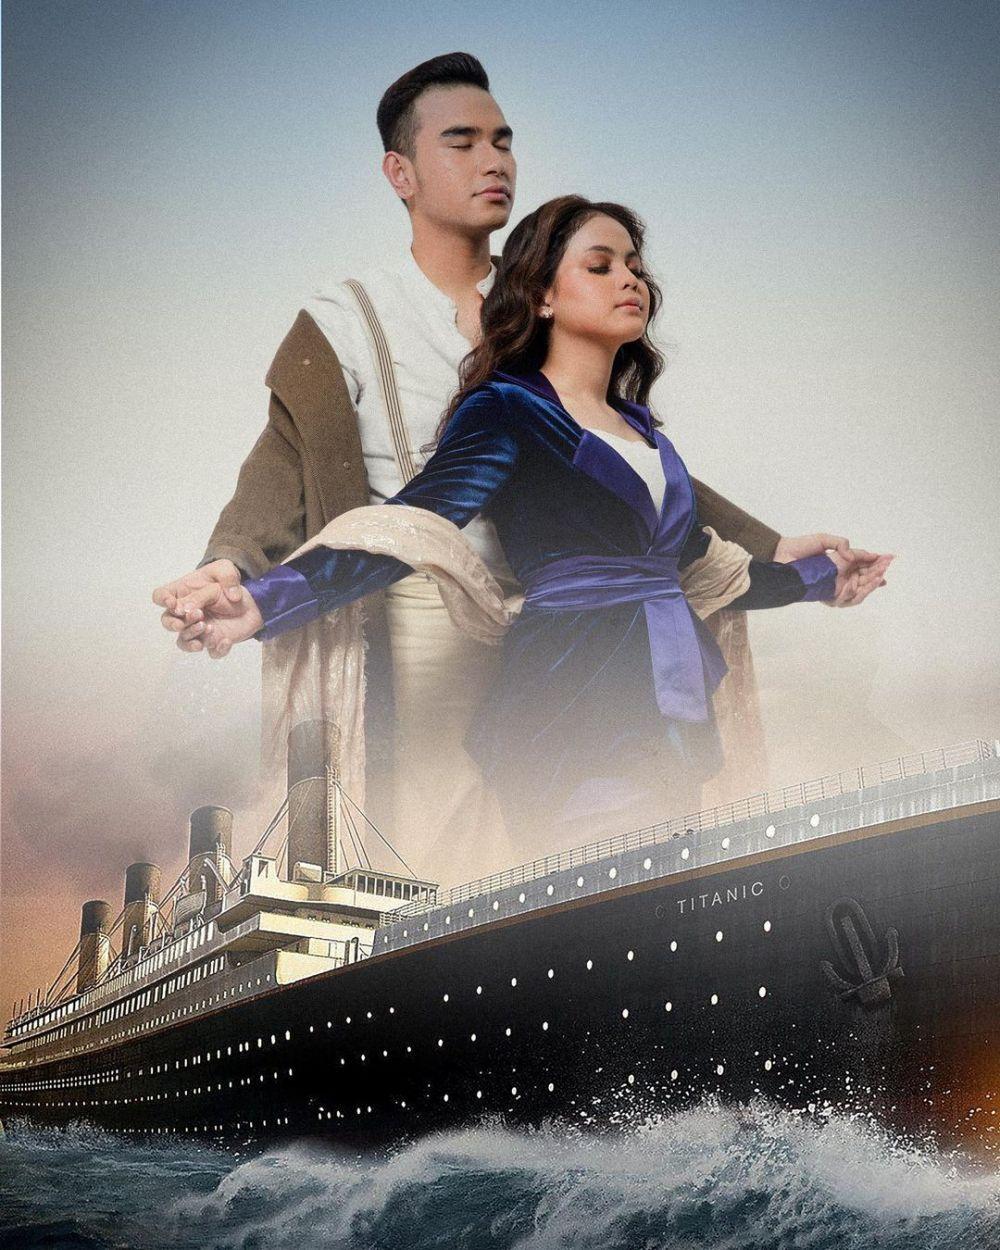 9 Pasang Seleb Tiru Pose Ala Titanic, Ada Romantis dan Kocak